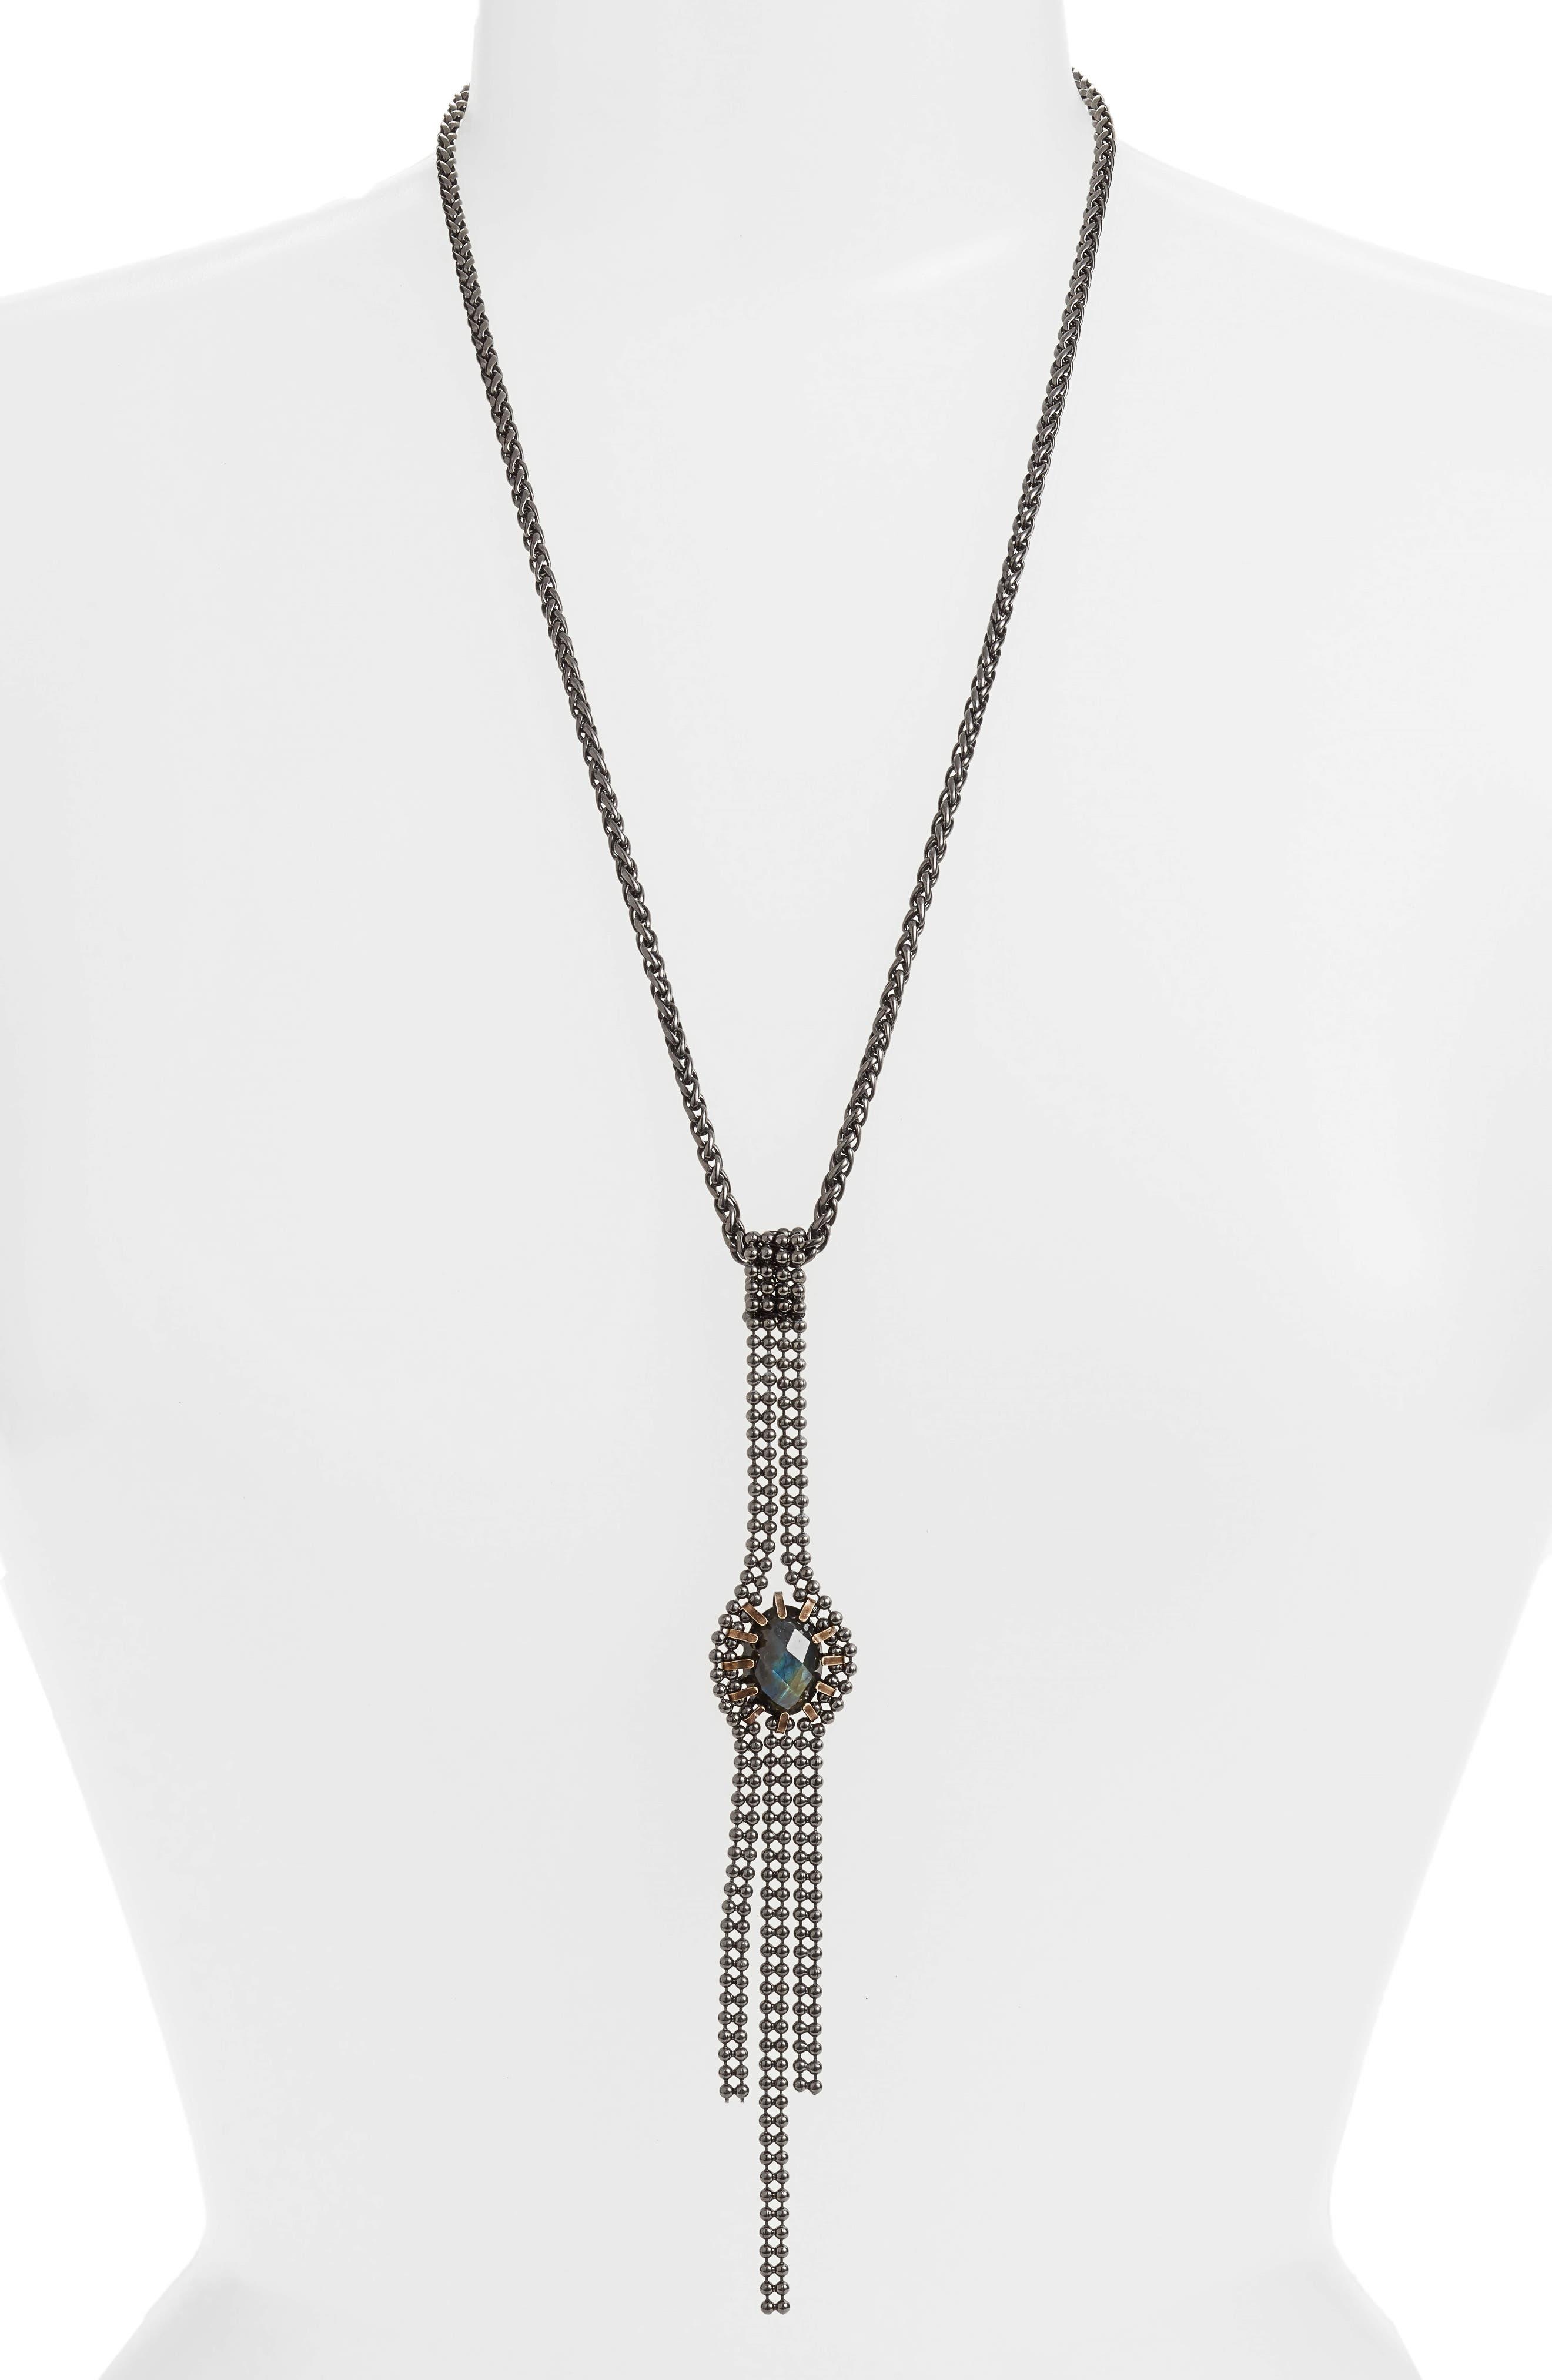 Alternate Image 1 Selected - Cynthia Desser Labradorite Pendant Necklace